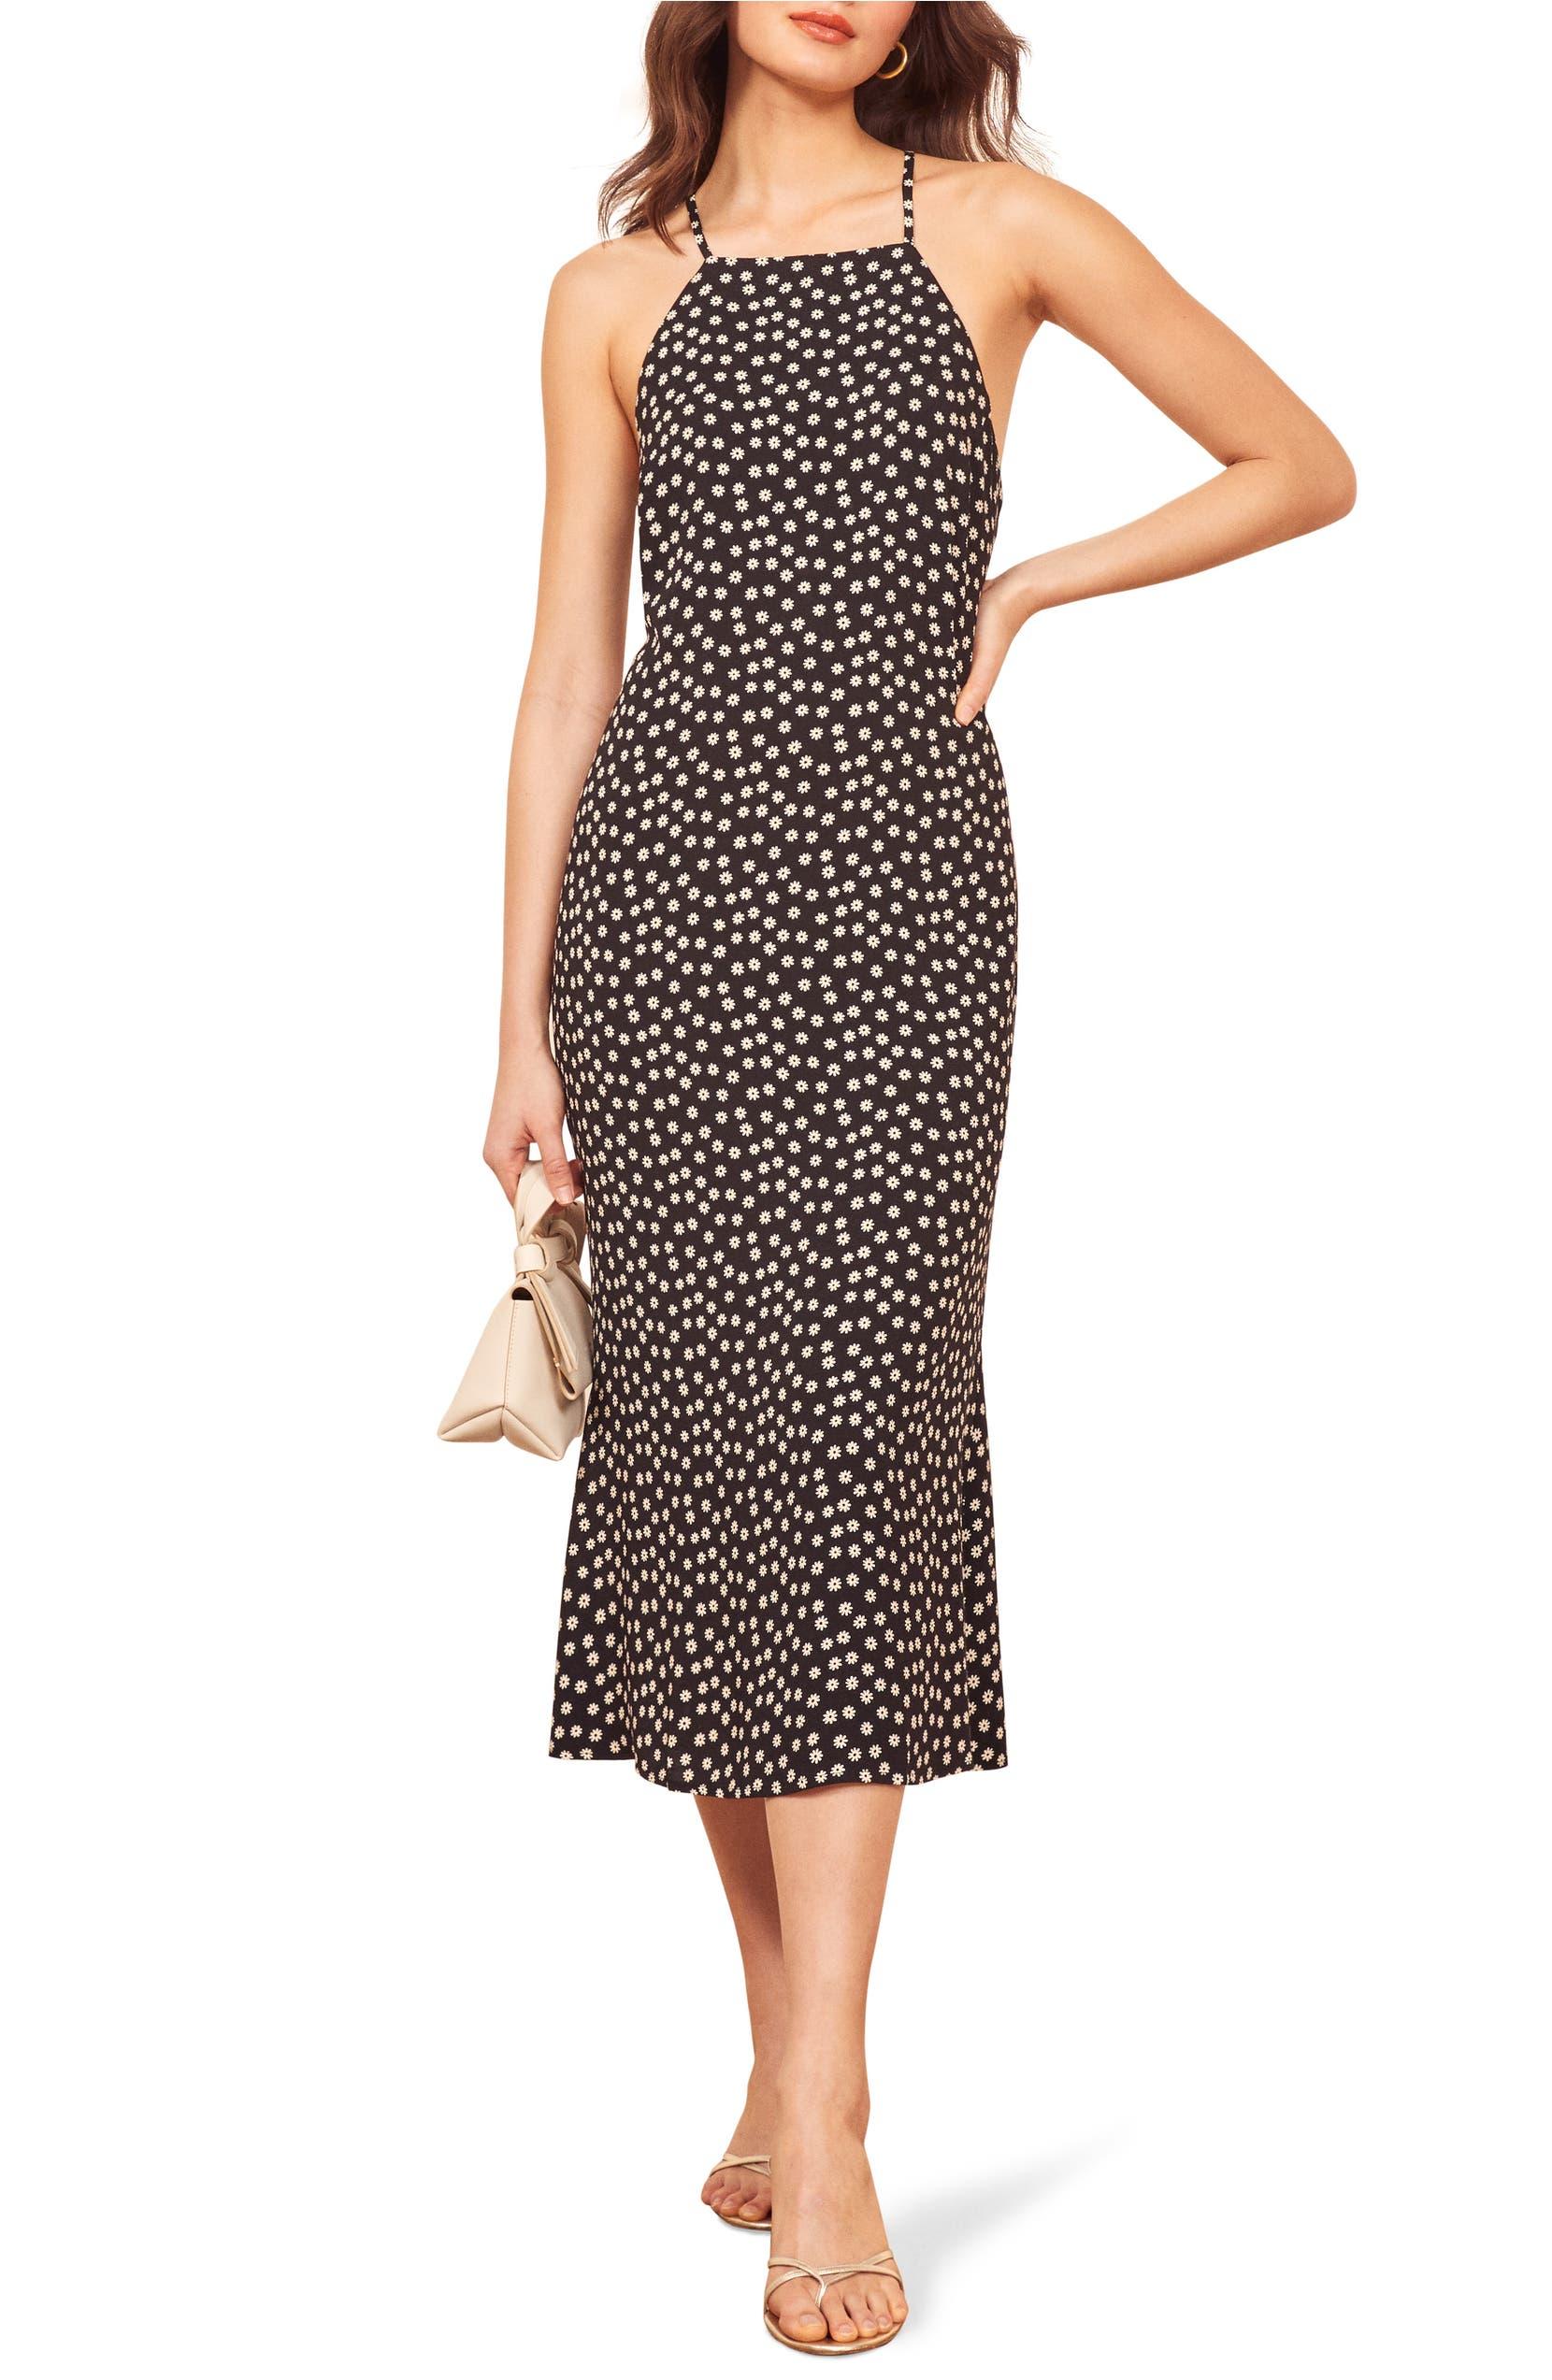 976479b154 Roman Midi Dress